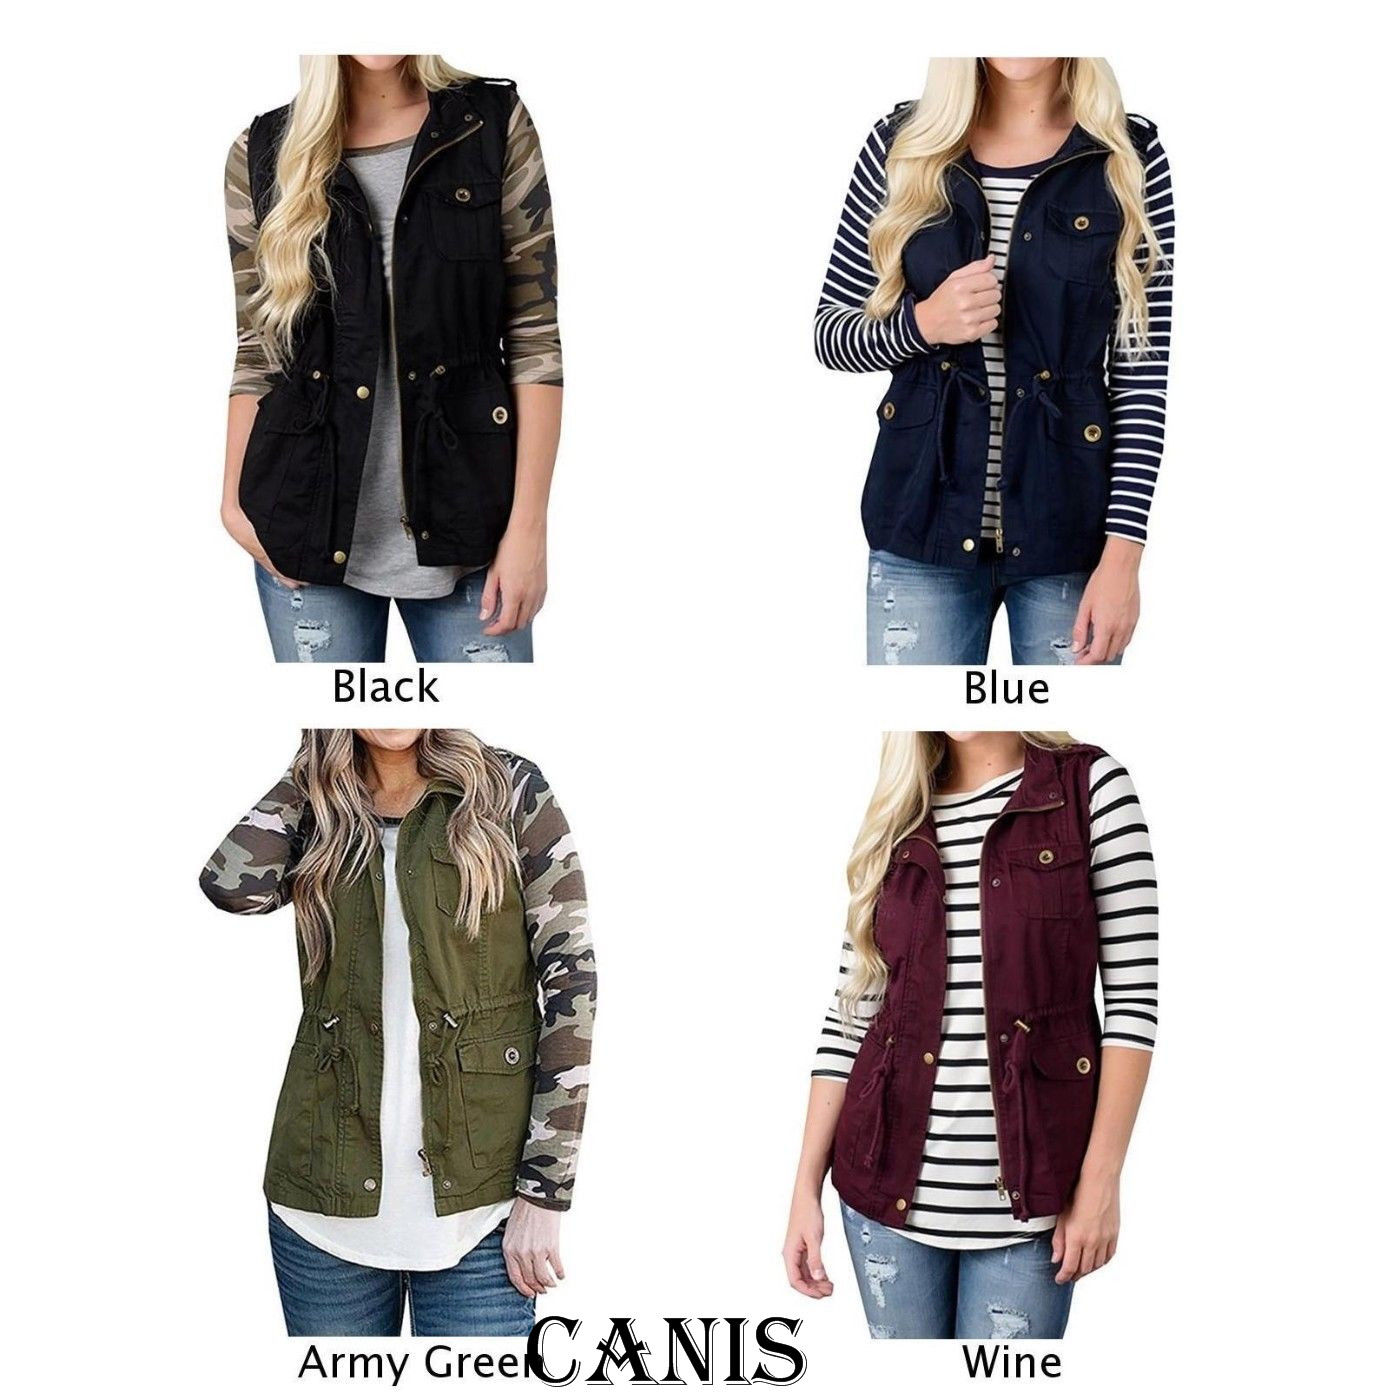 Women Coats Women Jacket Vest Cargo Utility Safari Vest W/Pockets Drawstring Army Top Bomber Jacket Coat